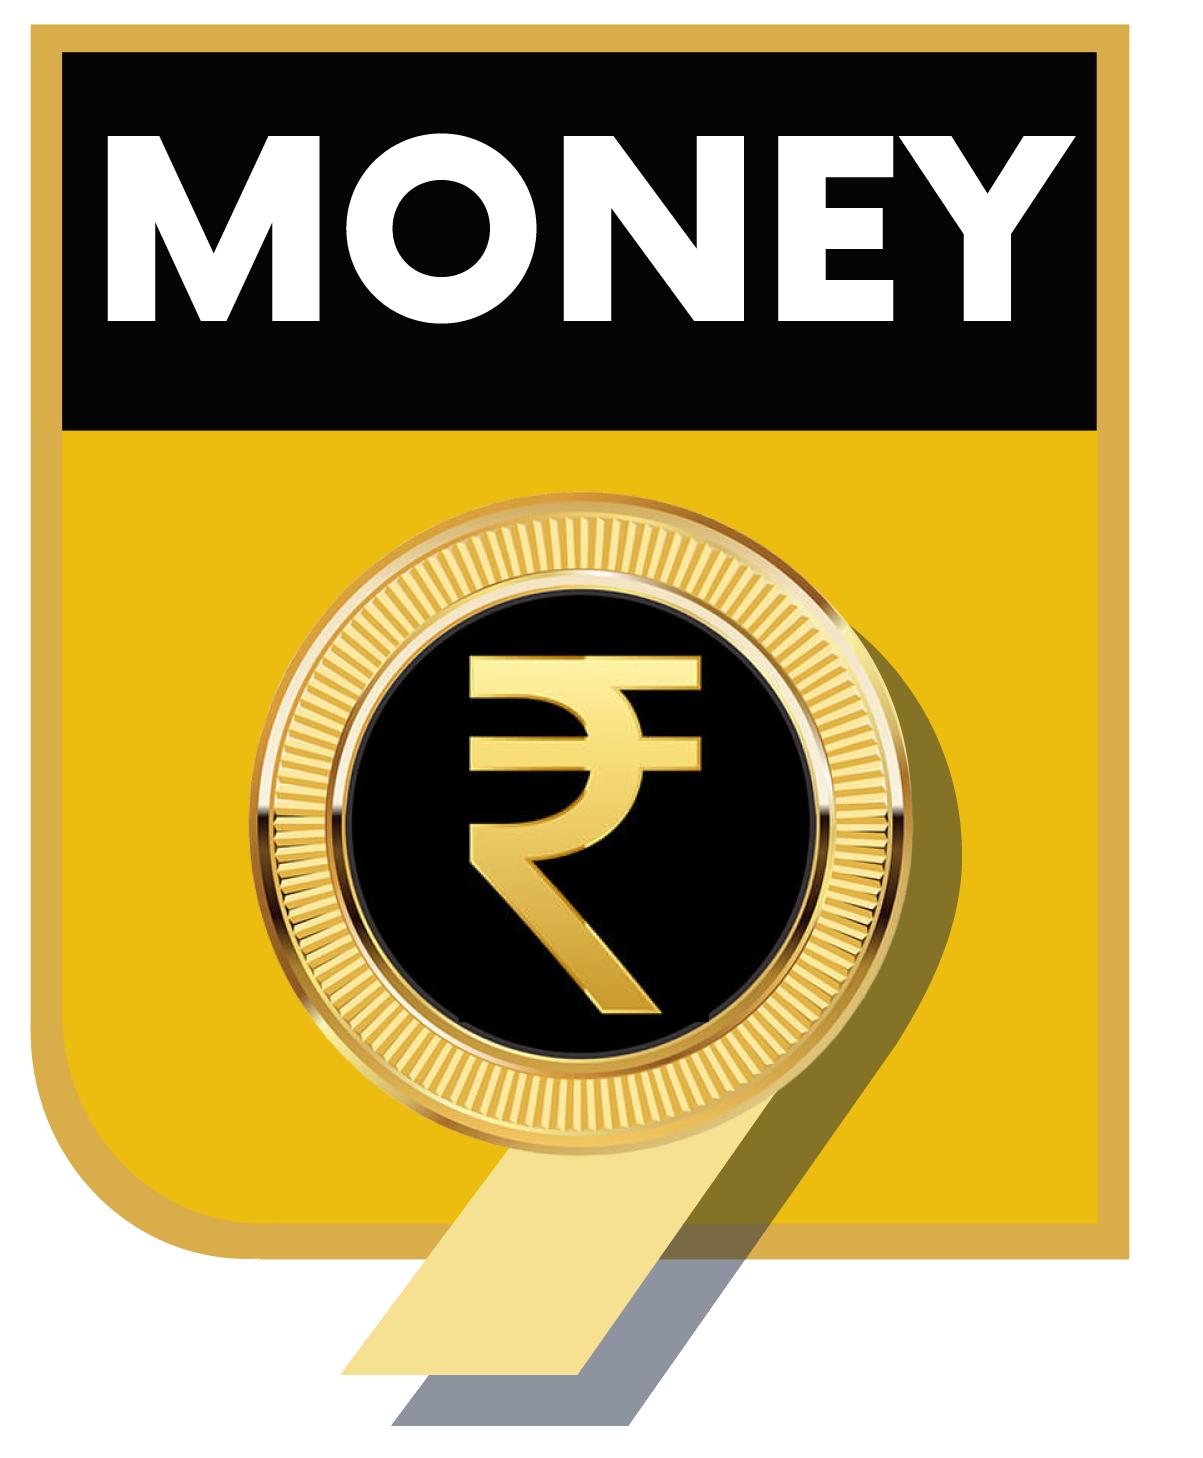 Money9 final brand identity unit artwork with crop mark & bleed 060121 (1)